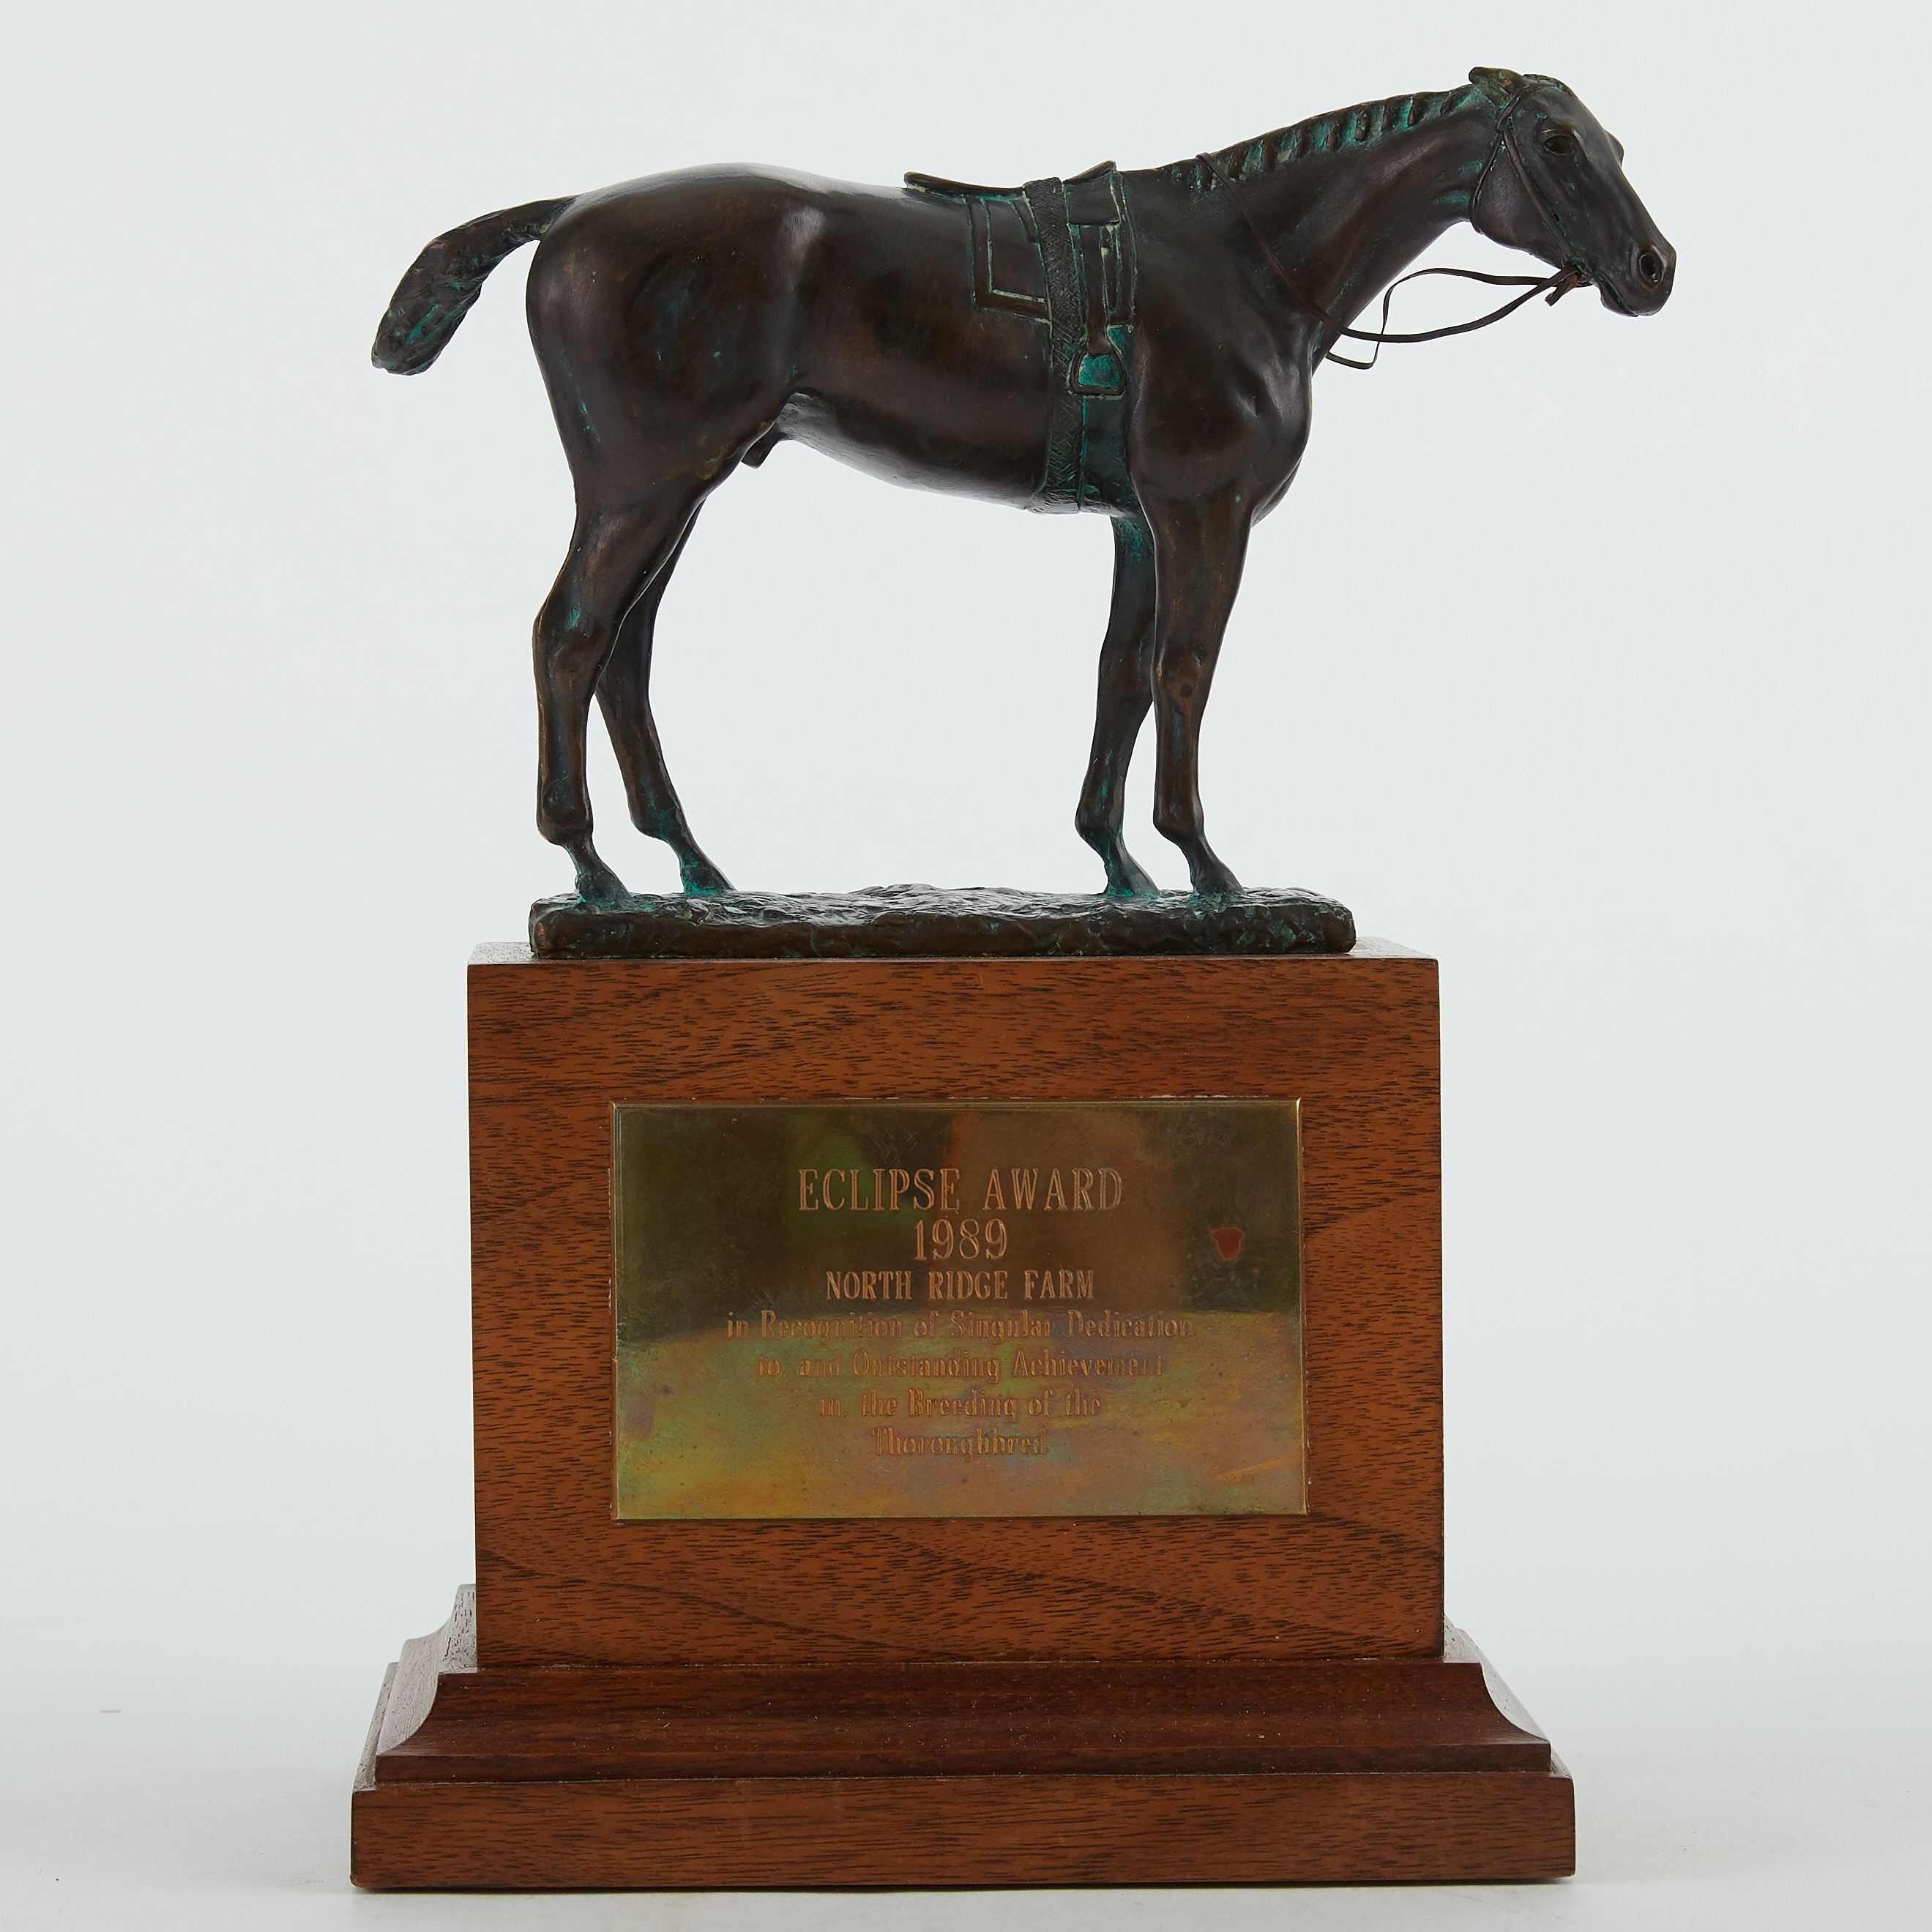 Lot 268: Eclipse Award 1989 North Ridge Farm